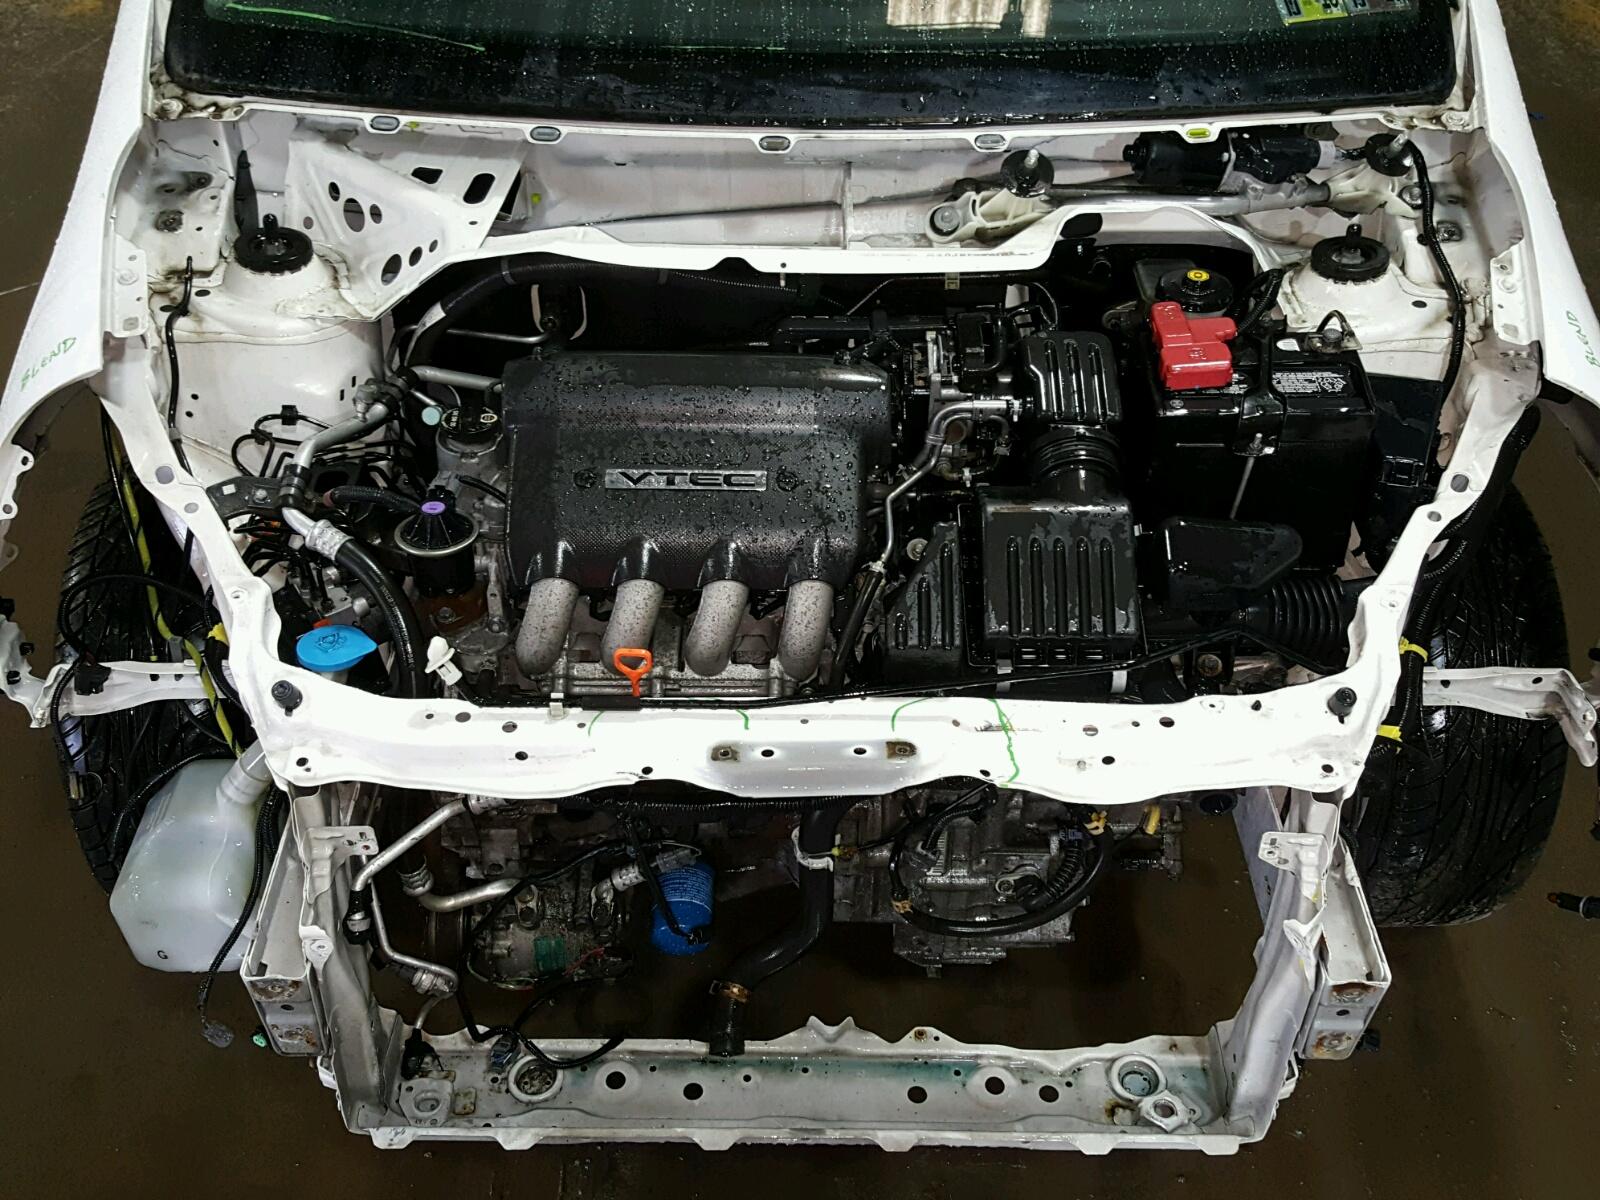 ... JHMGD38667S027133   2007 Honda Fit S 1.5L Inside View JHMGD38667S027133  ...